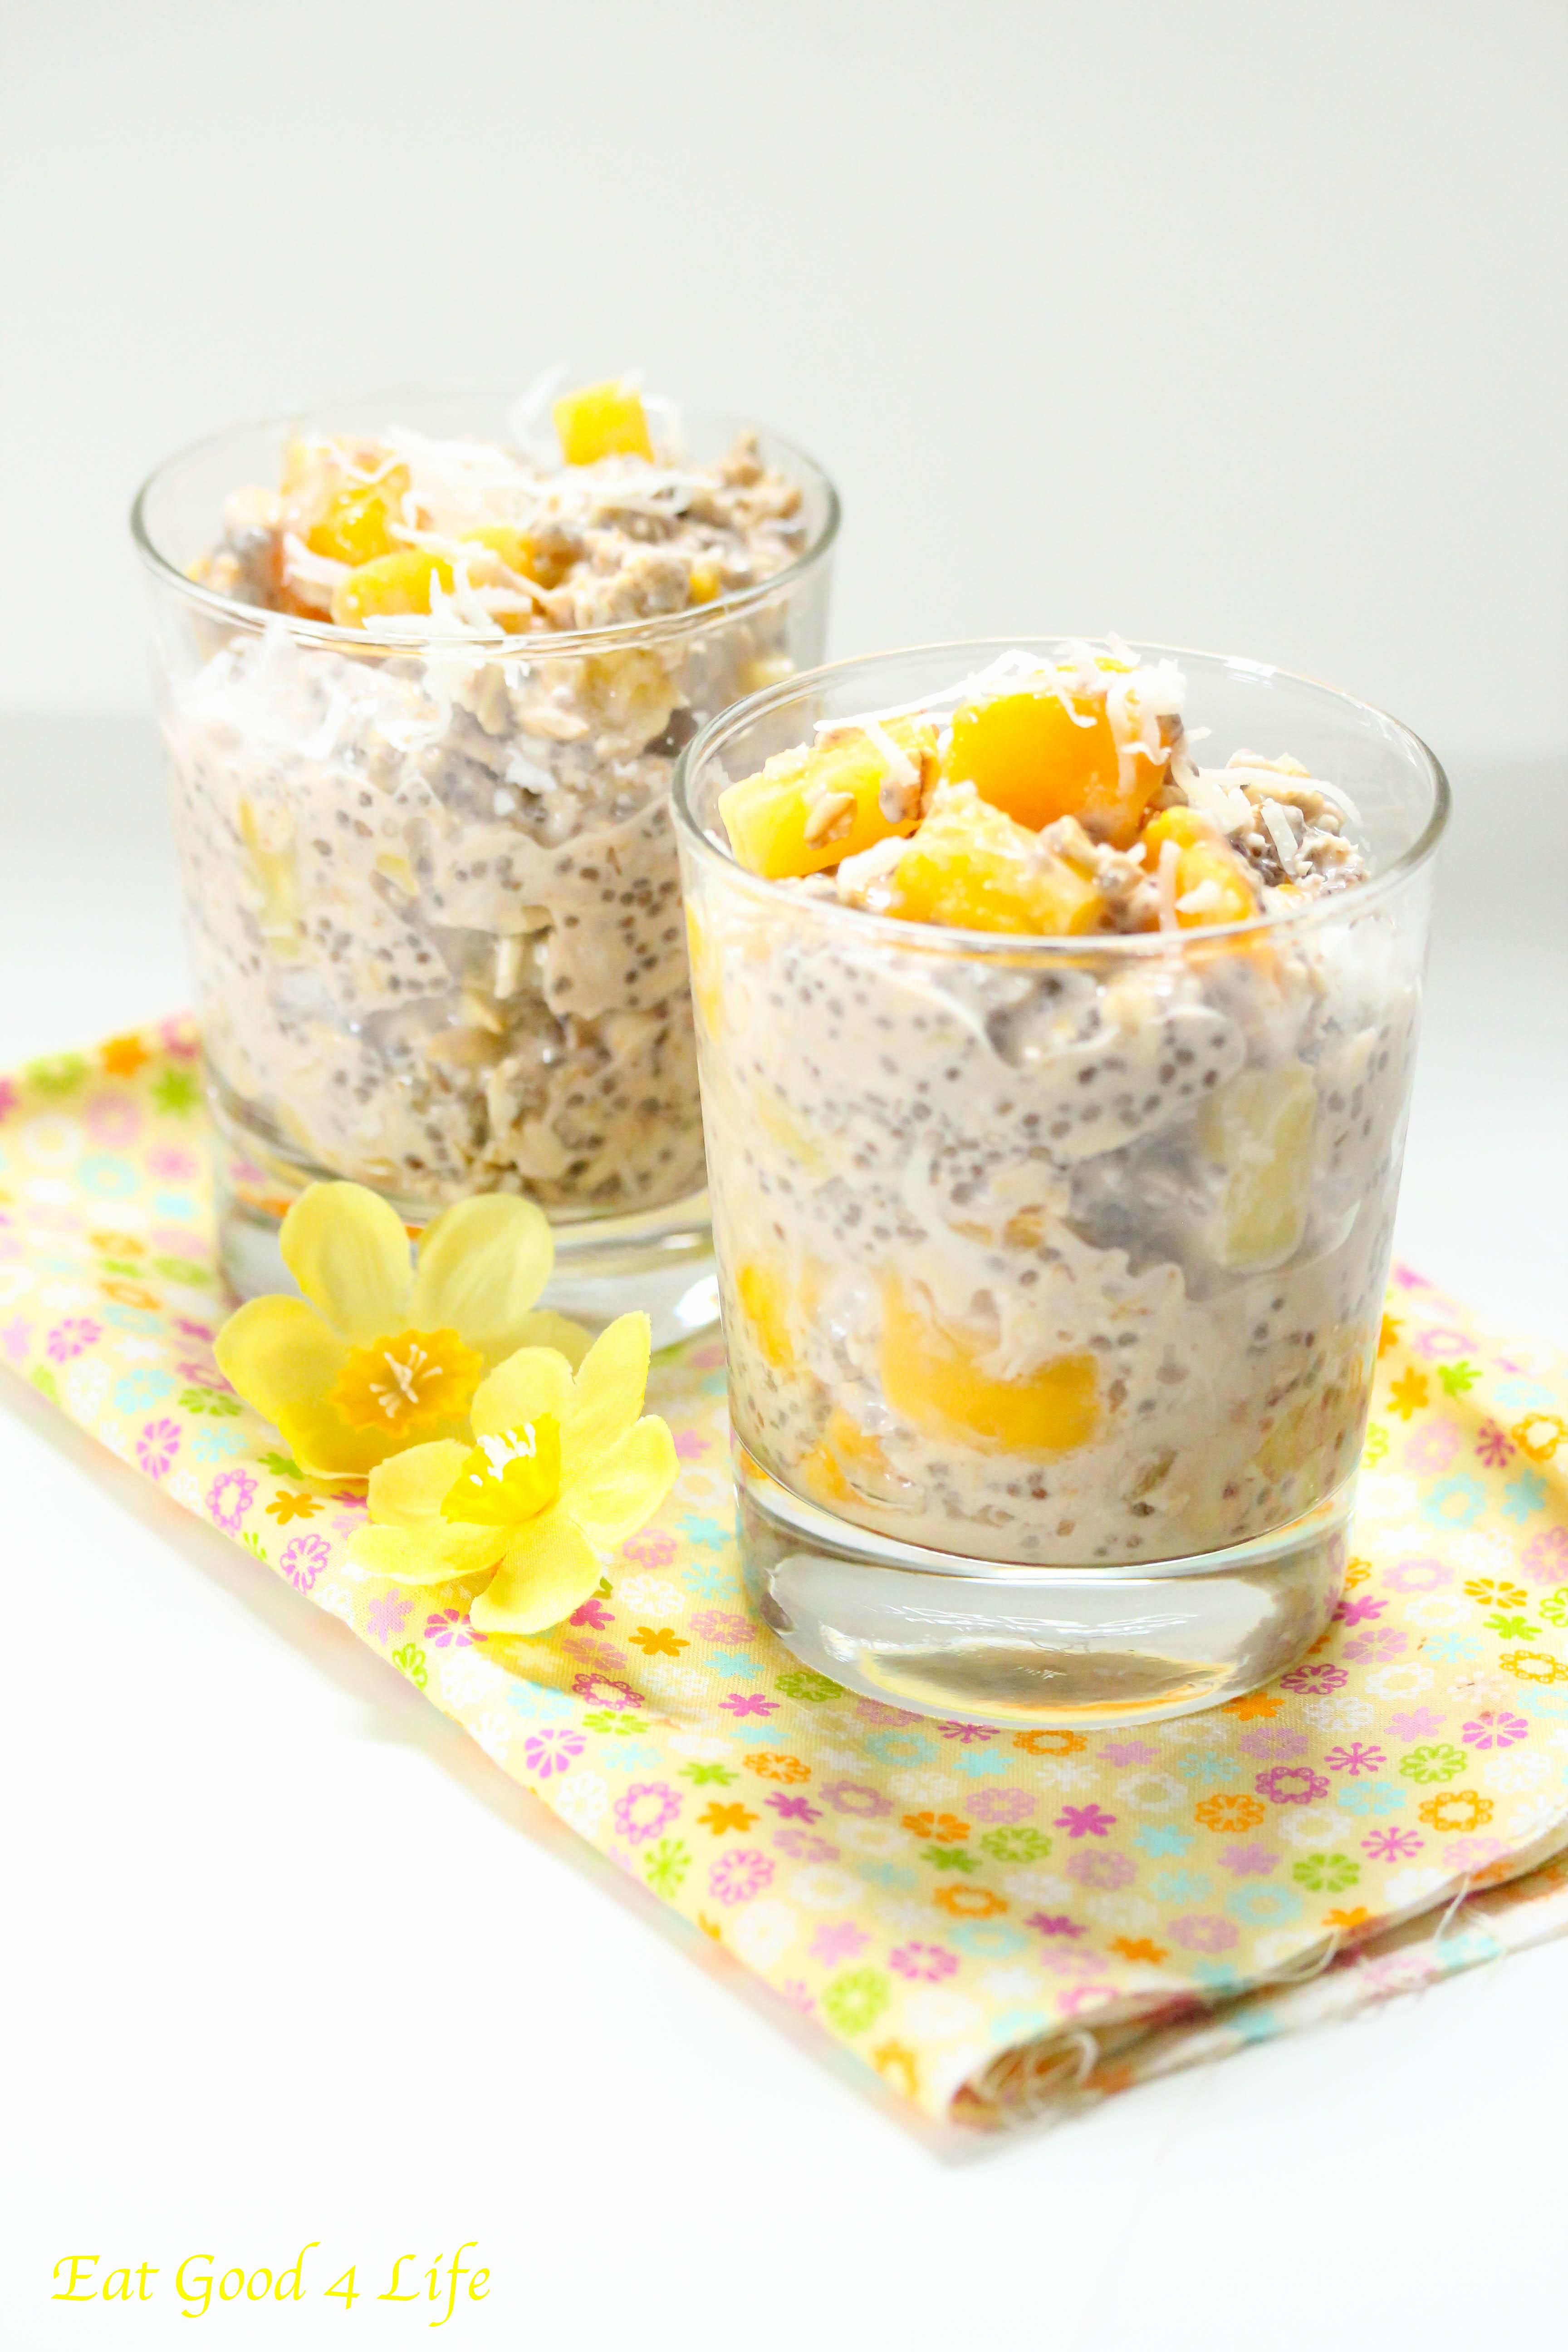 Overnight tropical oats